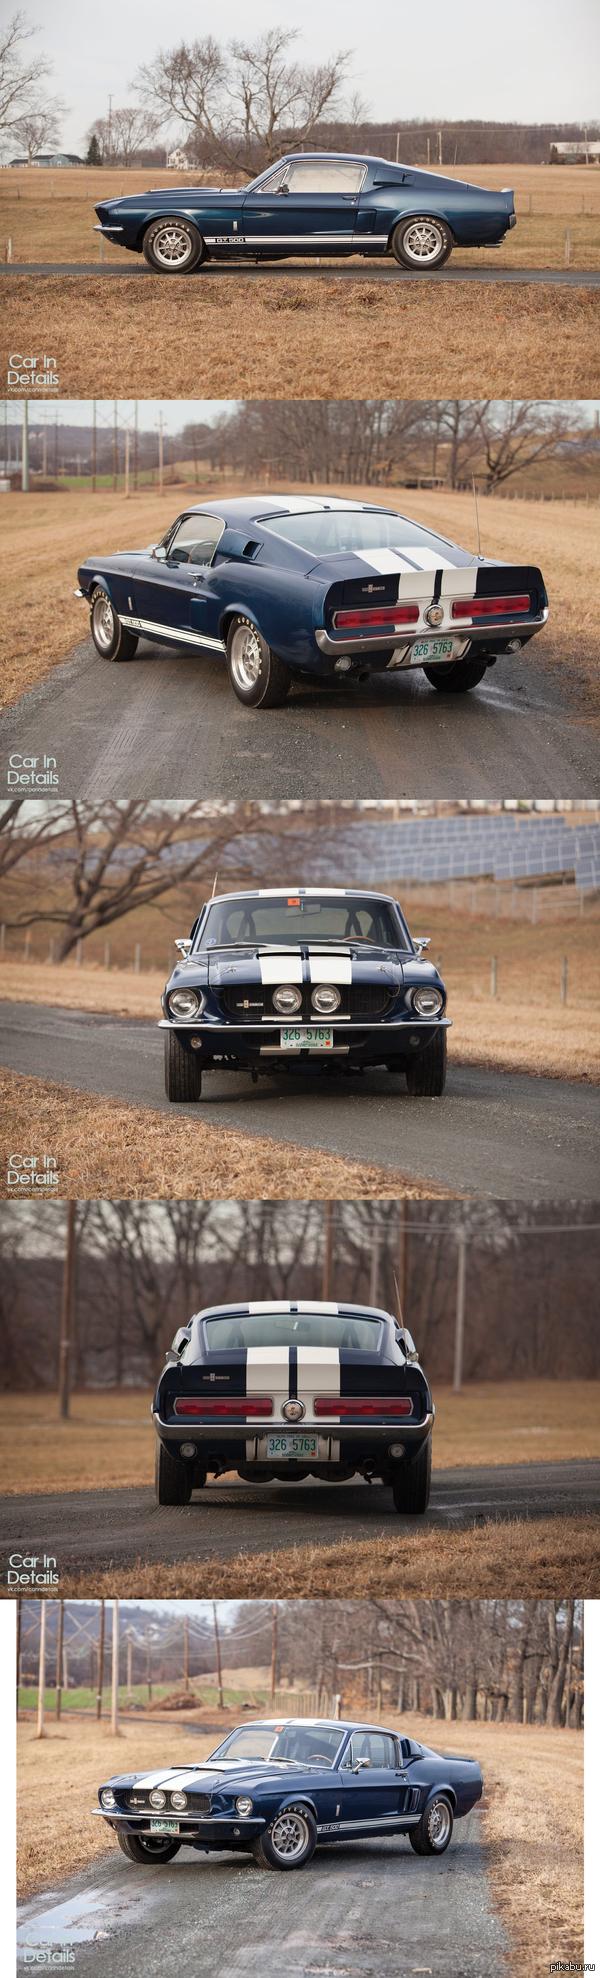 Shelby GT500 '1967 Фото взяты с вк.